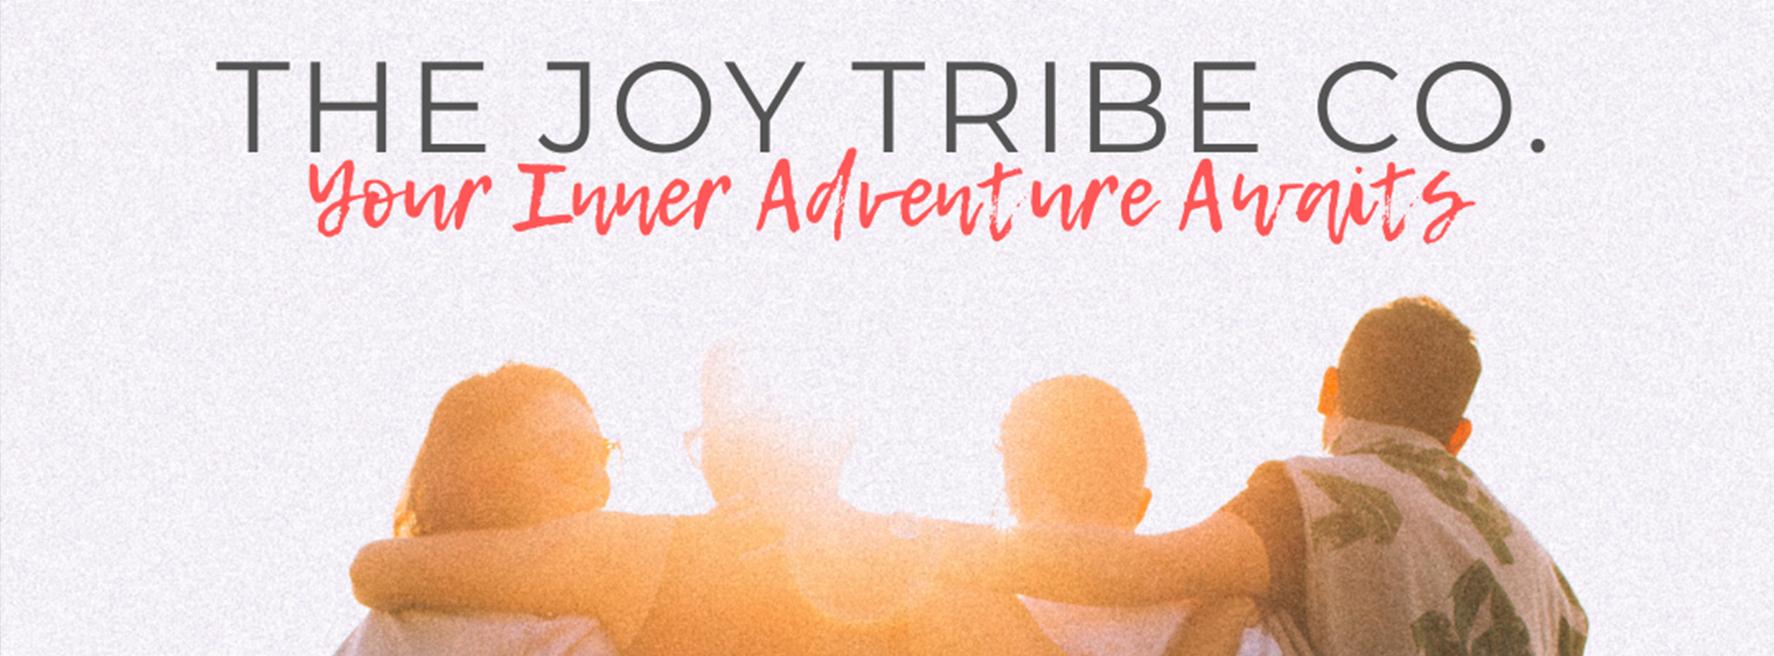 The Joy Tribe Co.